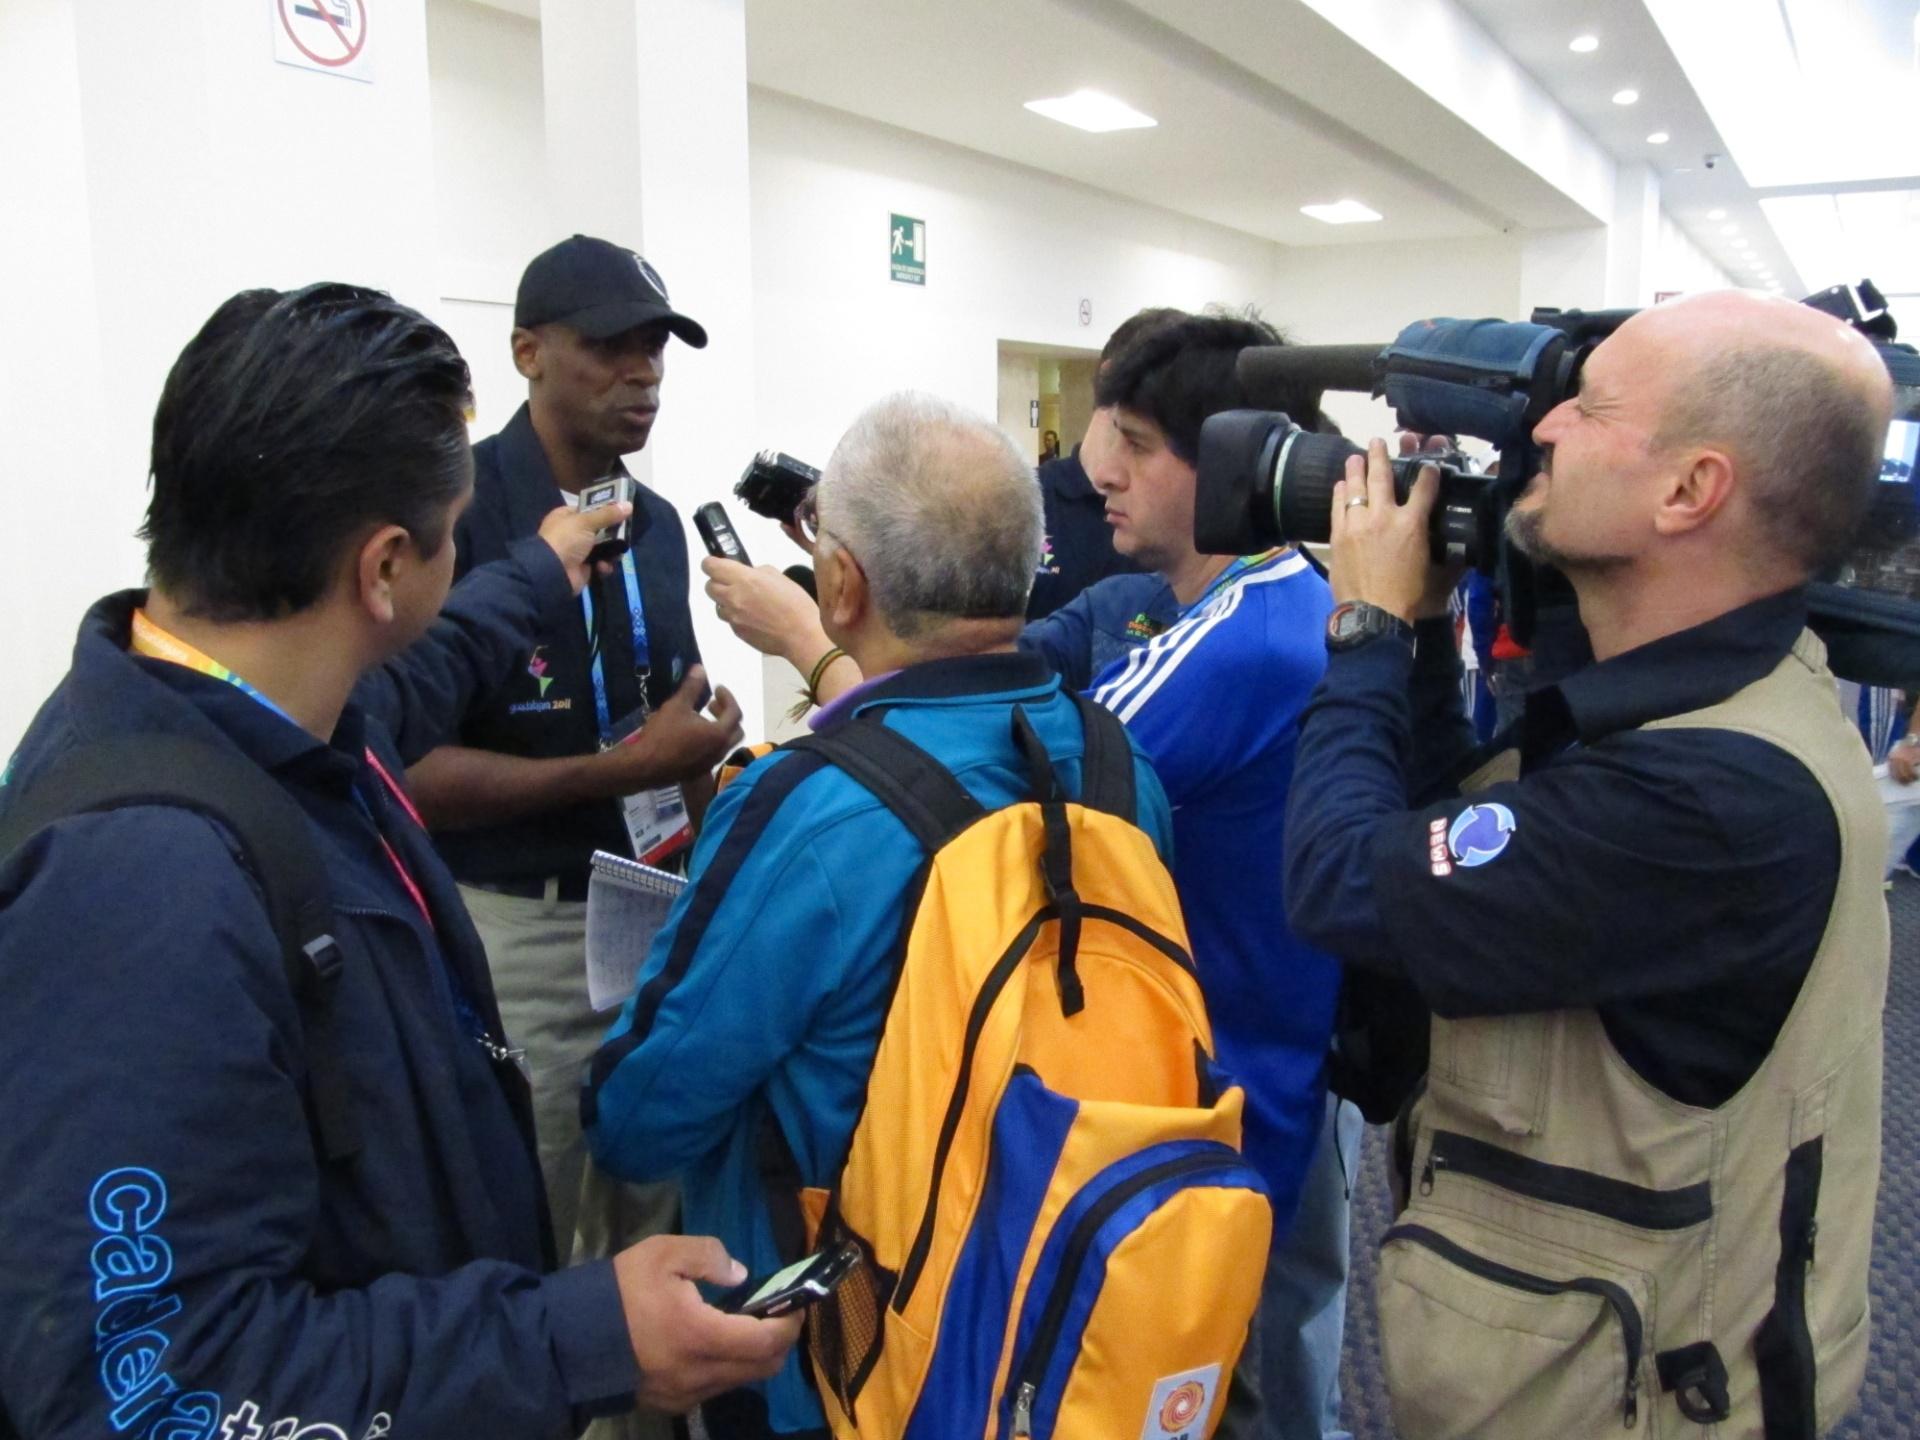 Robson Caetano dá entrevista a jornalistas no centro de imprensa dos Jogos Pan-Americanos de Guadalajara